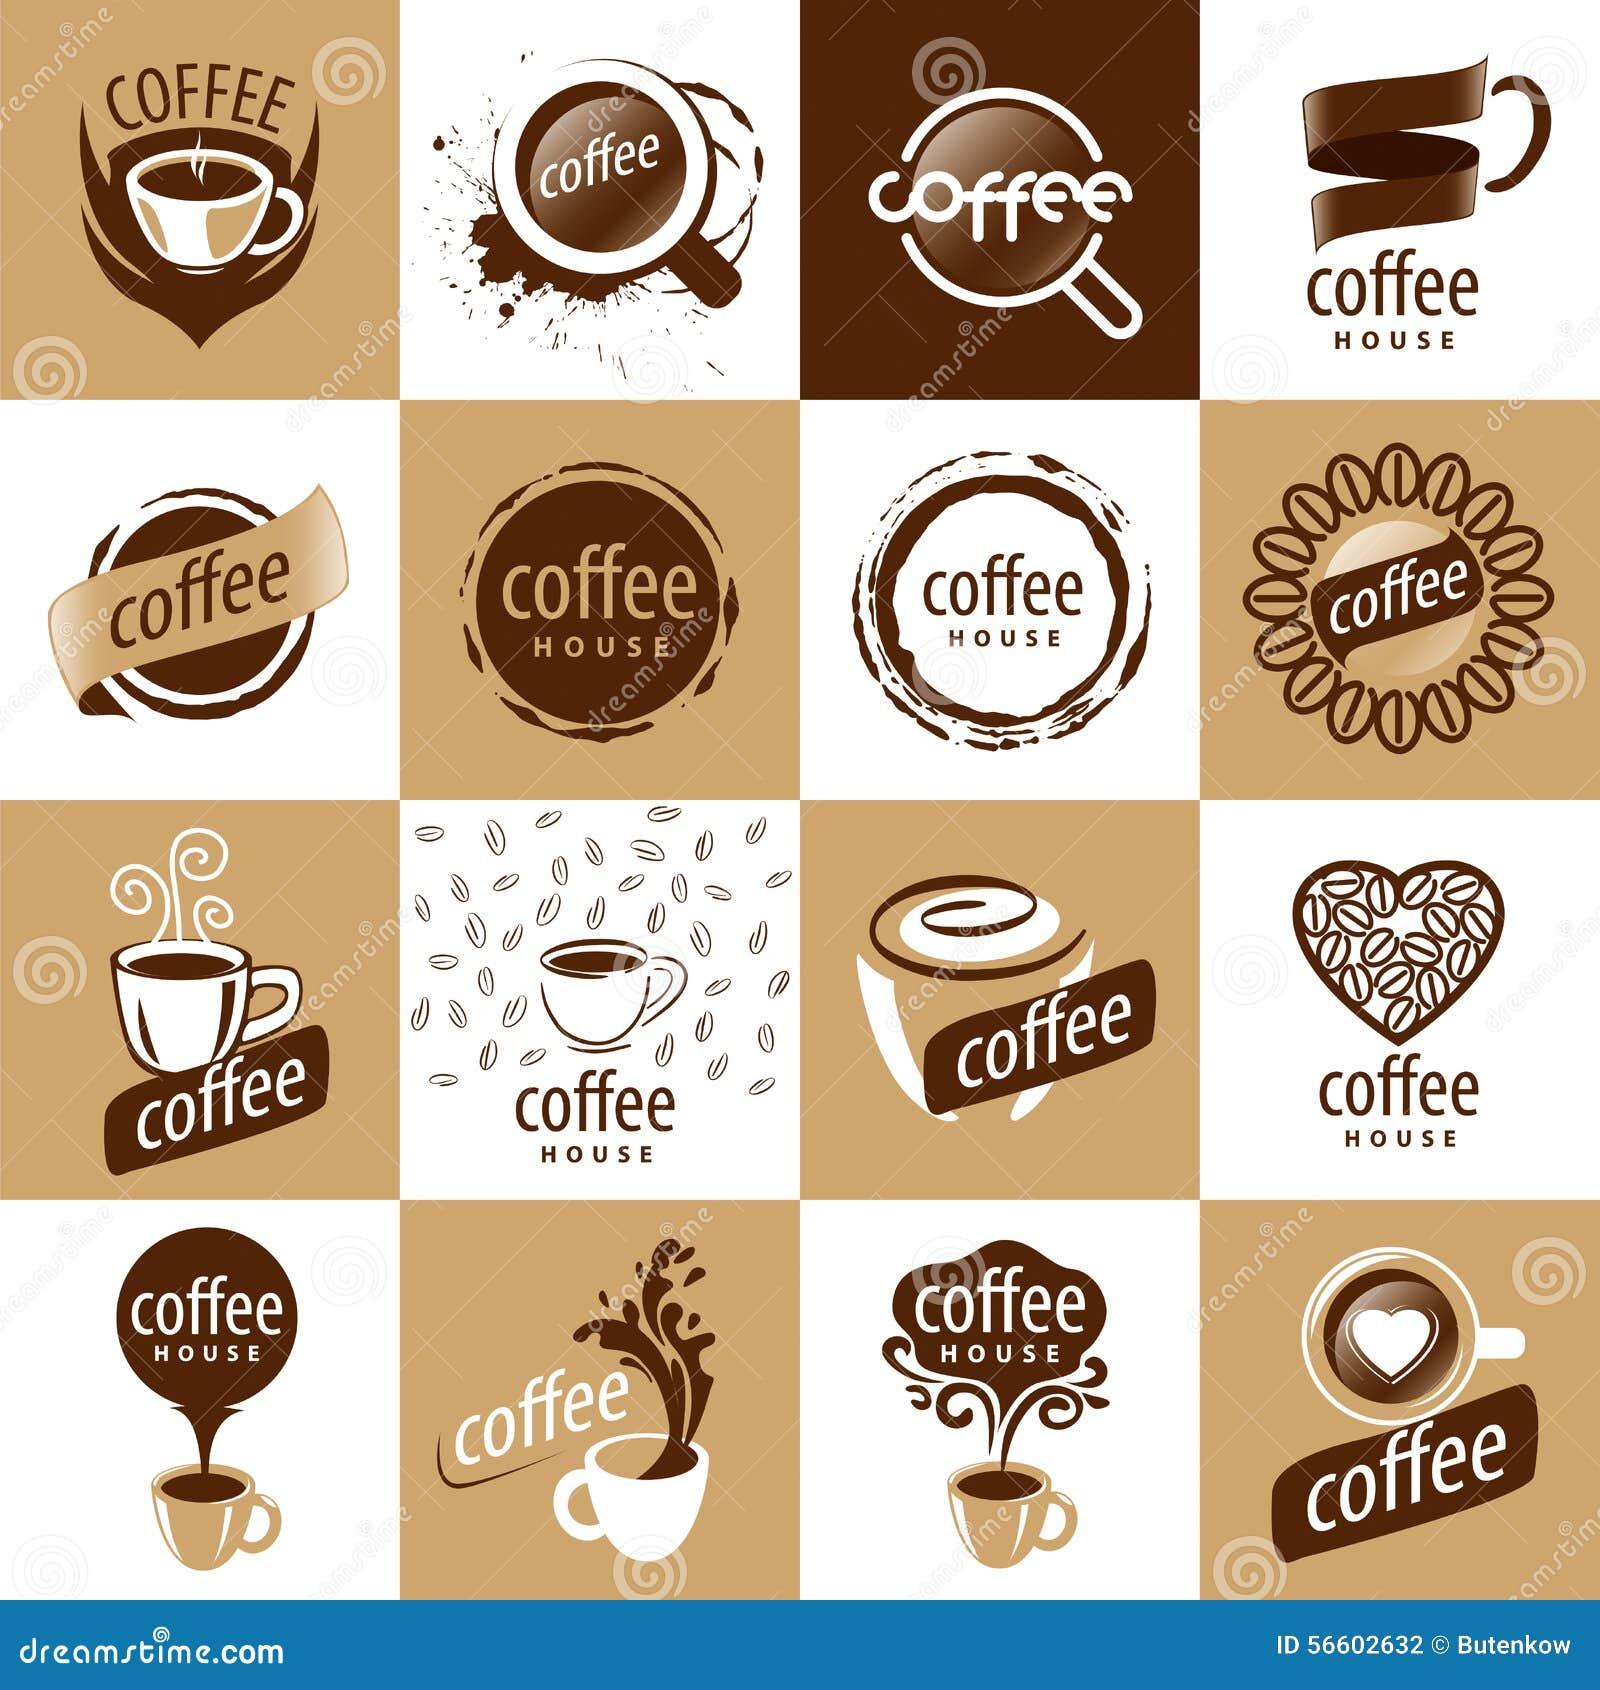 Set of vector logos coffee stock vector. Image of food